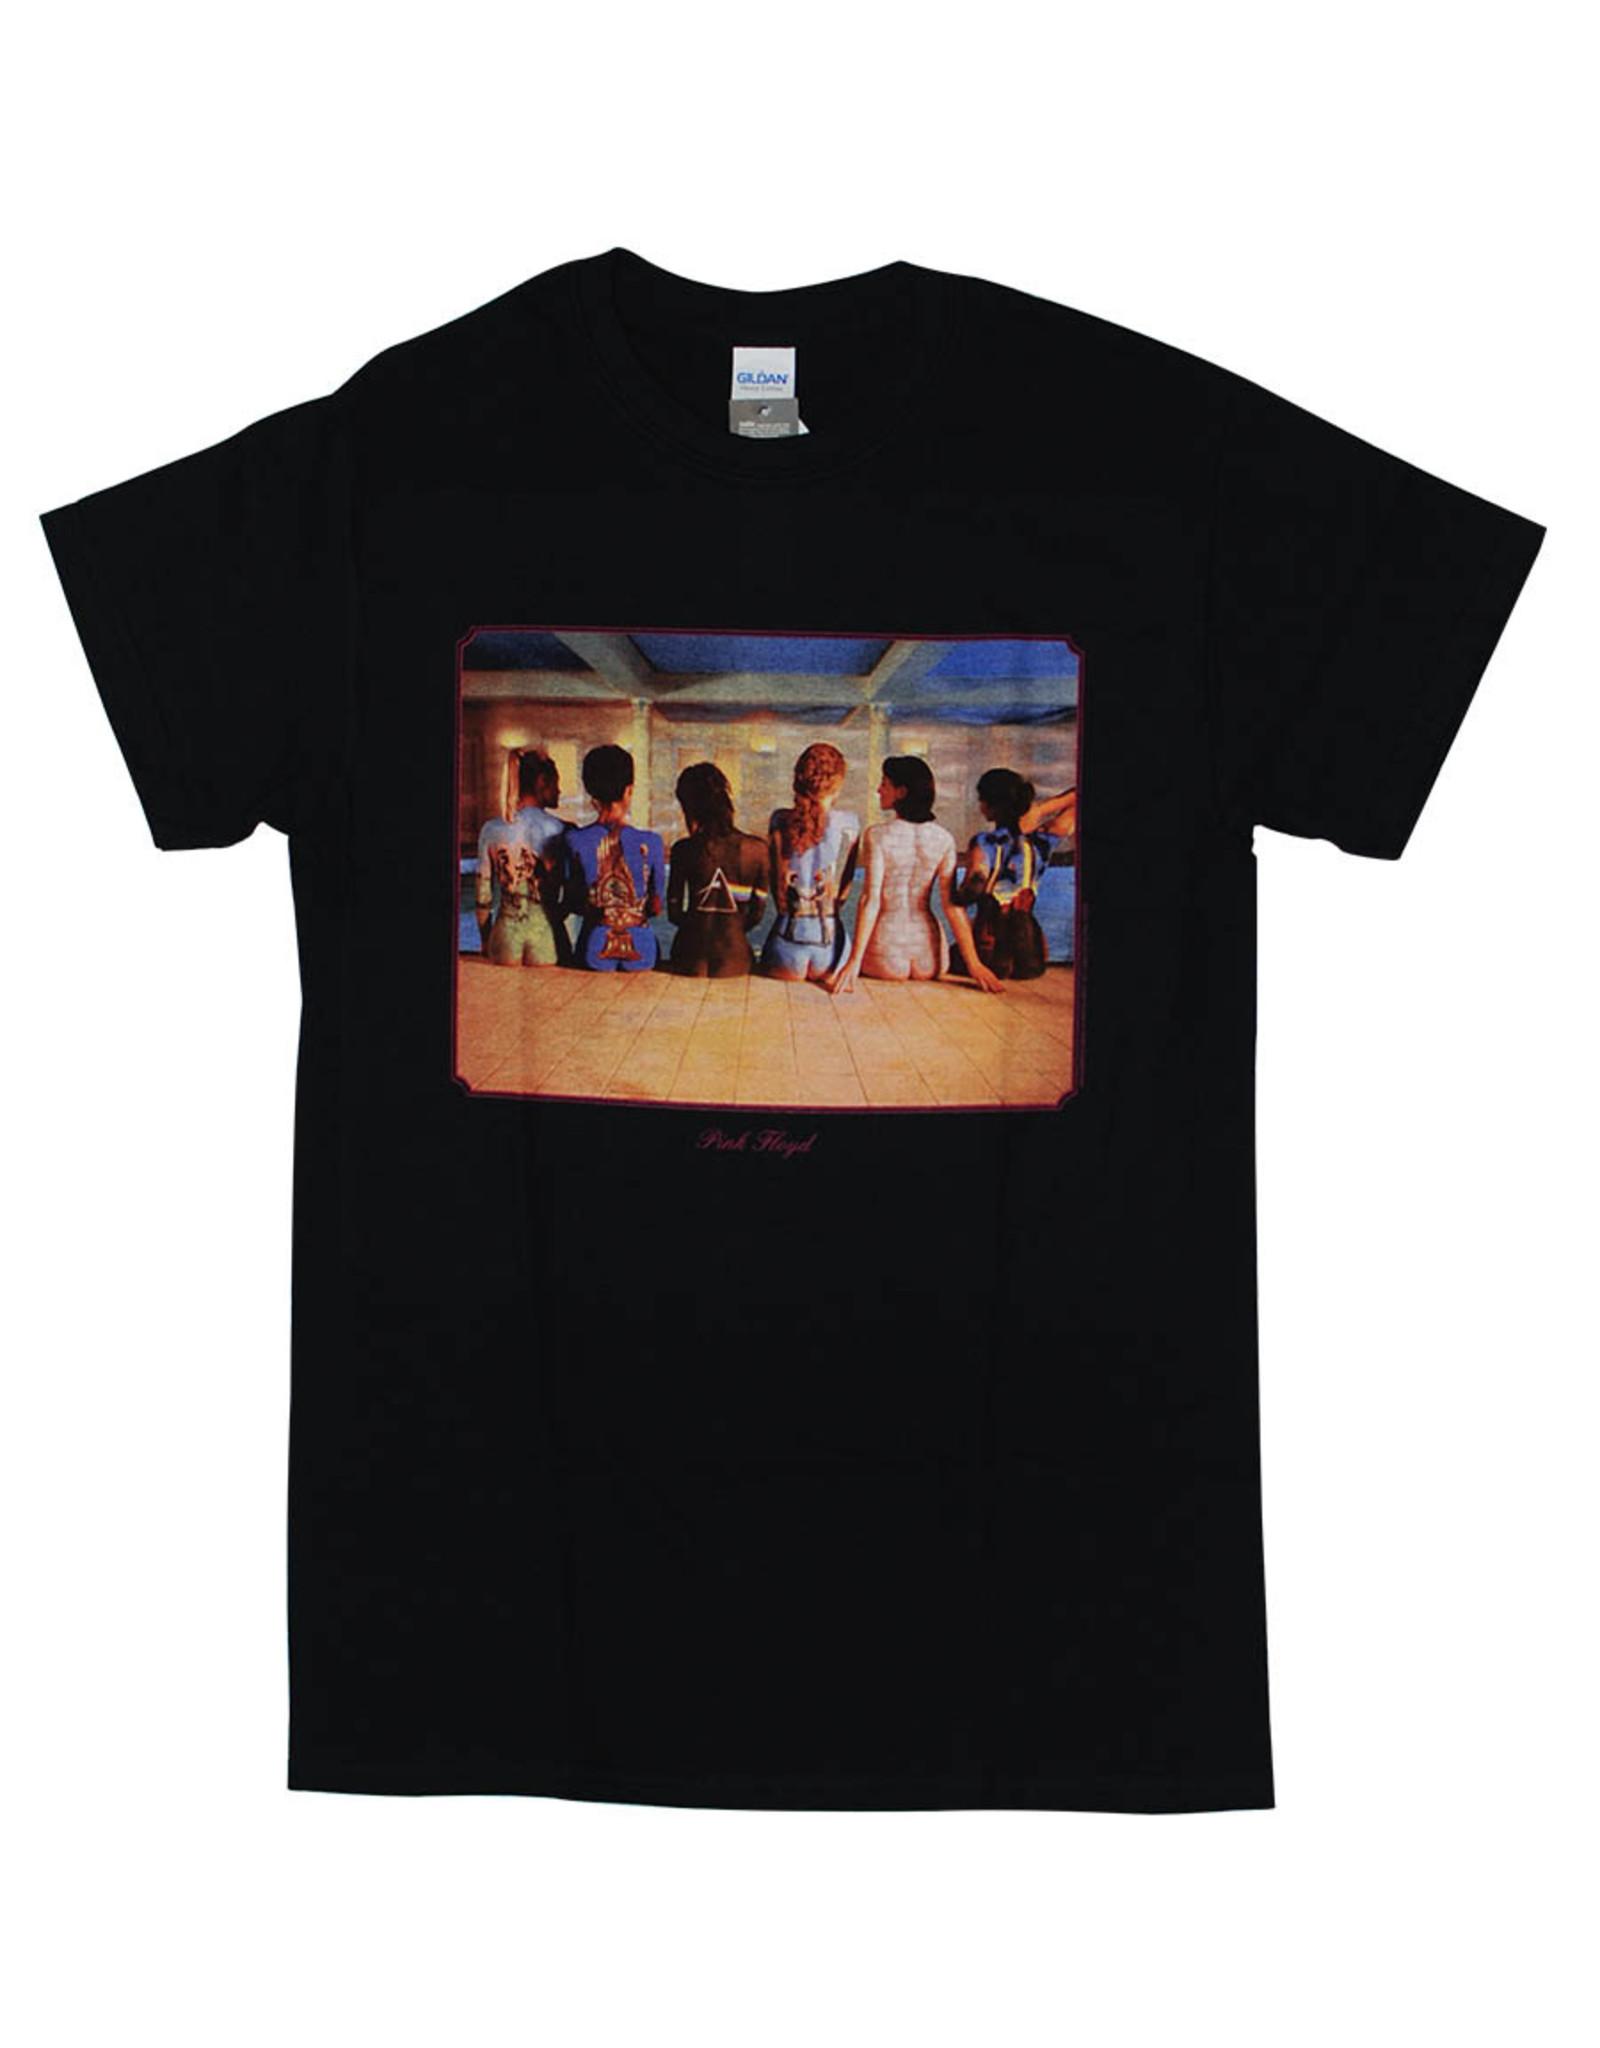 Star 500 Concert Series On Hollywood Tee Pink Floyd Back Catalouge S/S (Black)